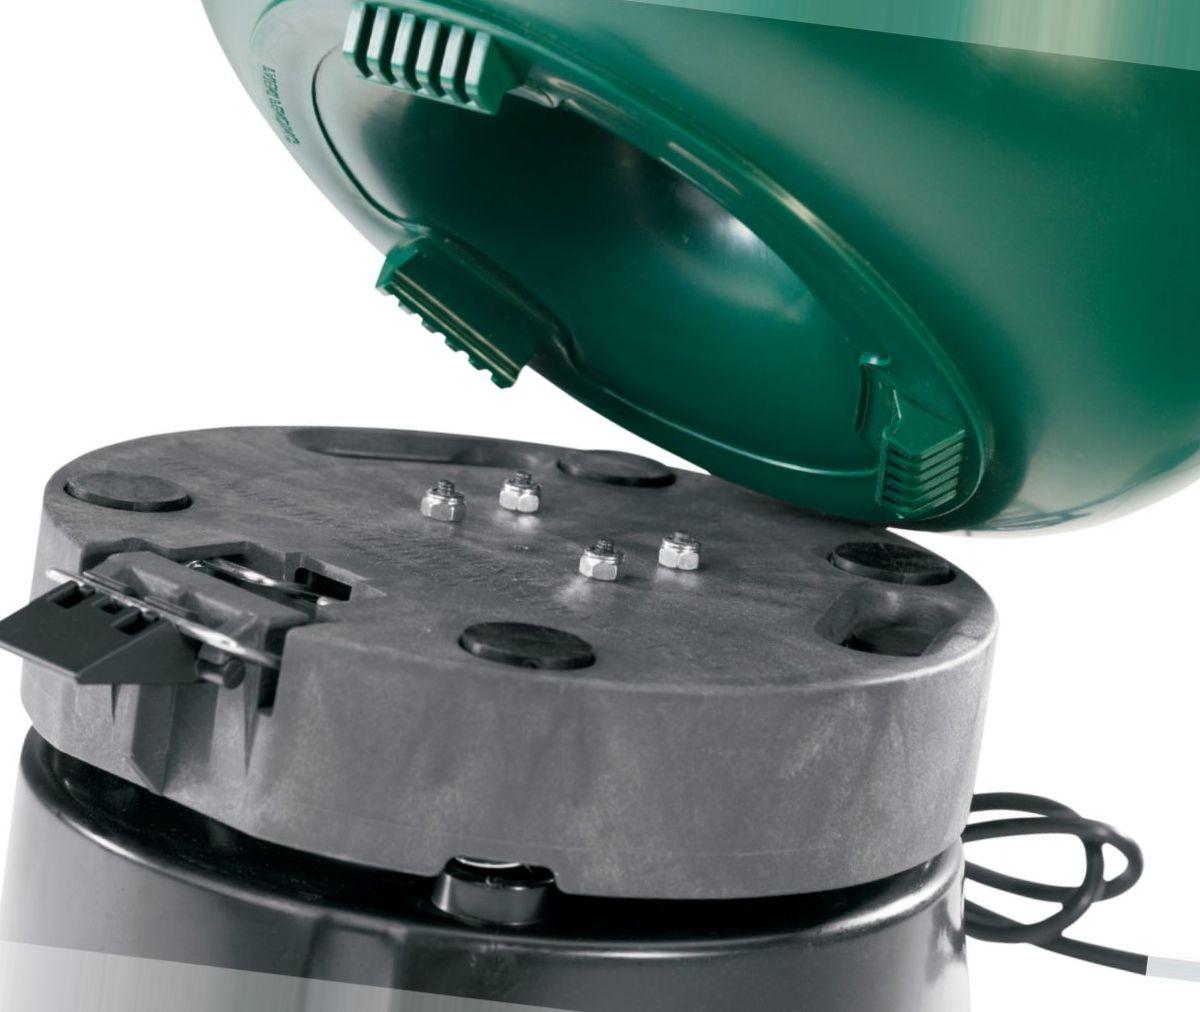 Cabela's Vibratory Tumbler with Detachable Bowl